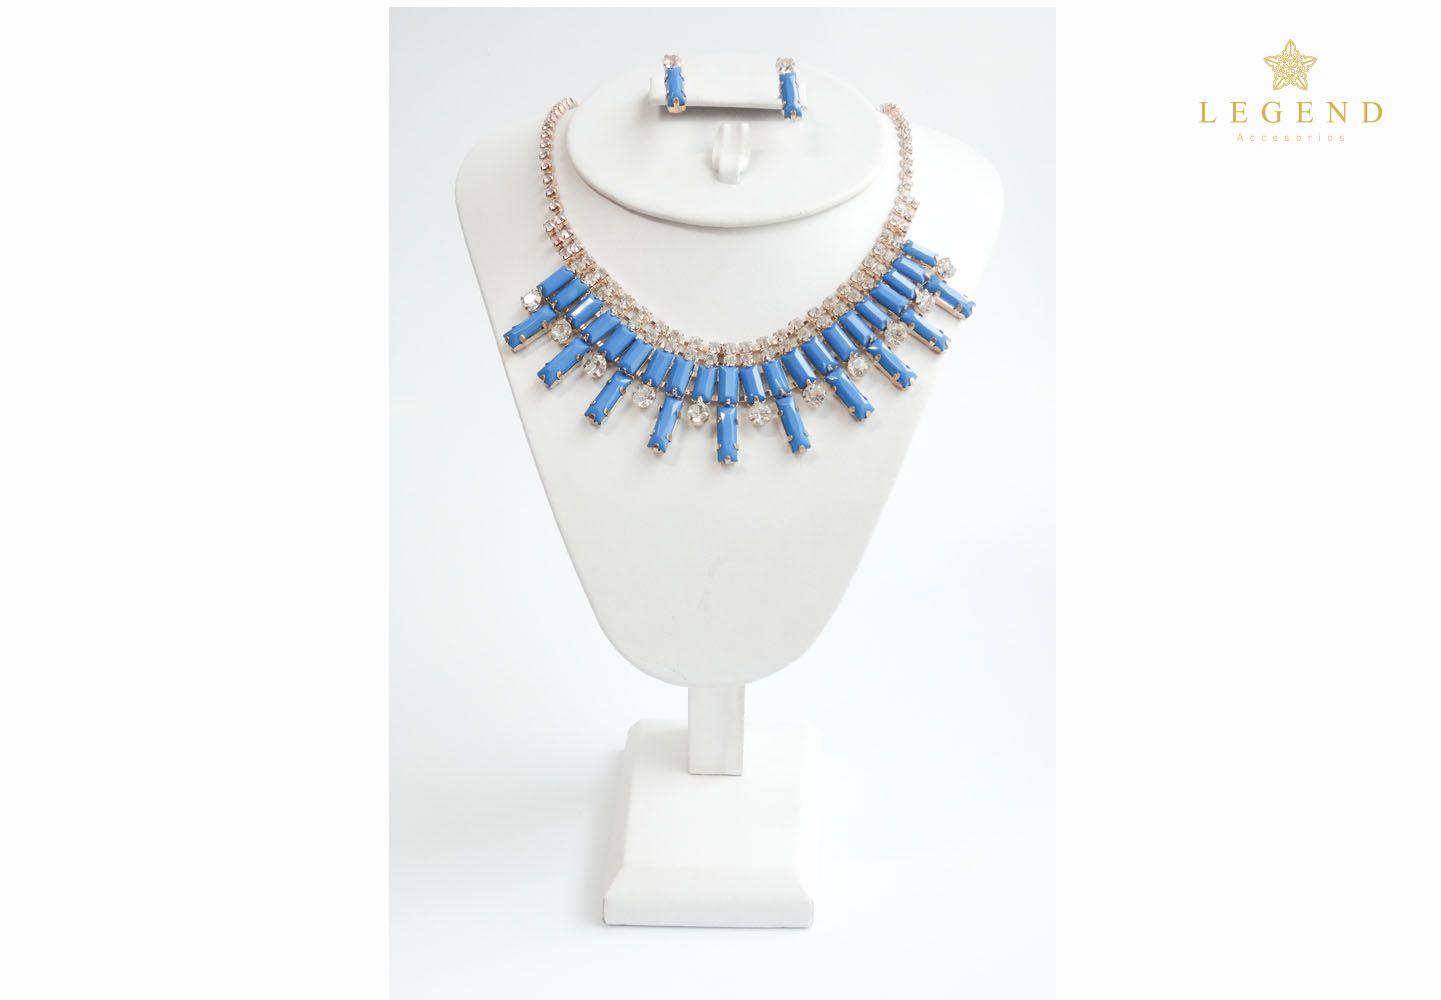 Collar de murano  http://www.legend.com.co/collares-13-collar-de-murano